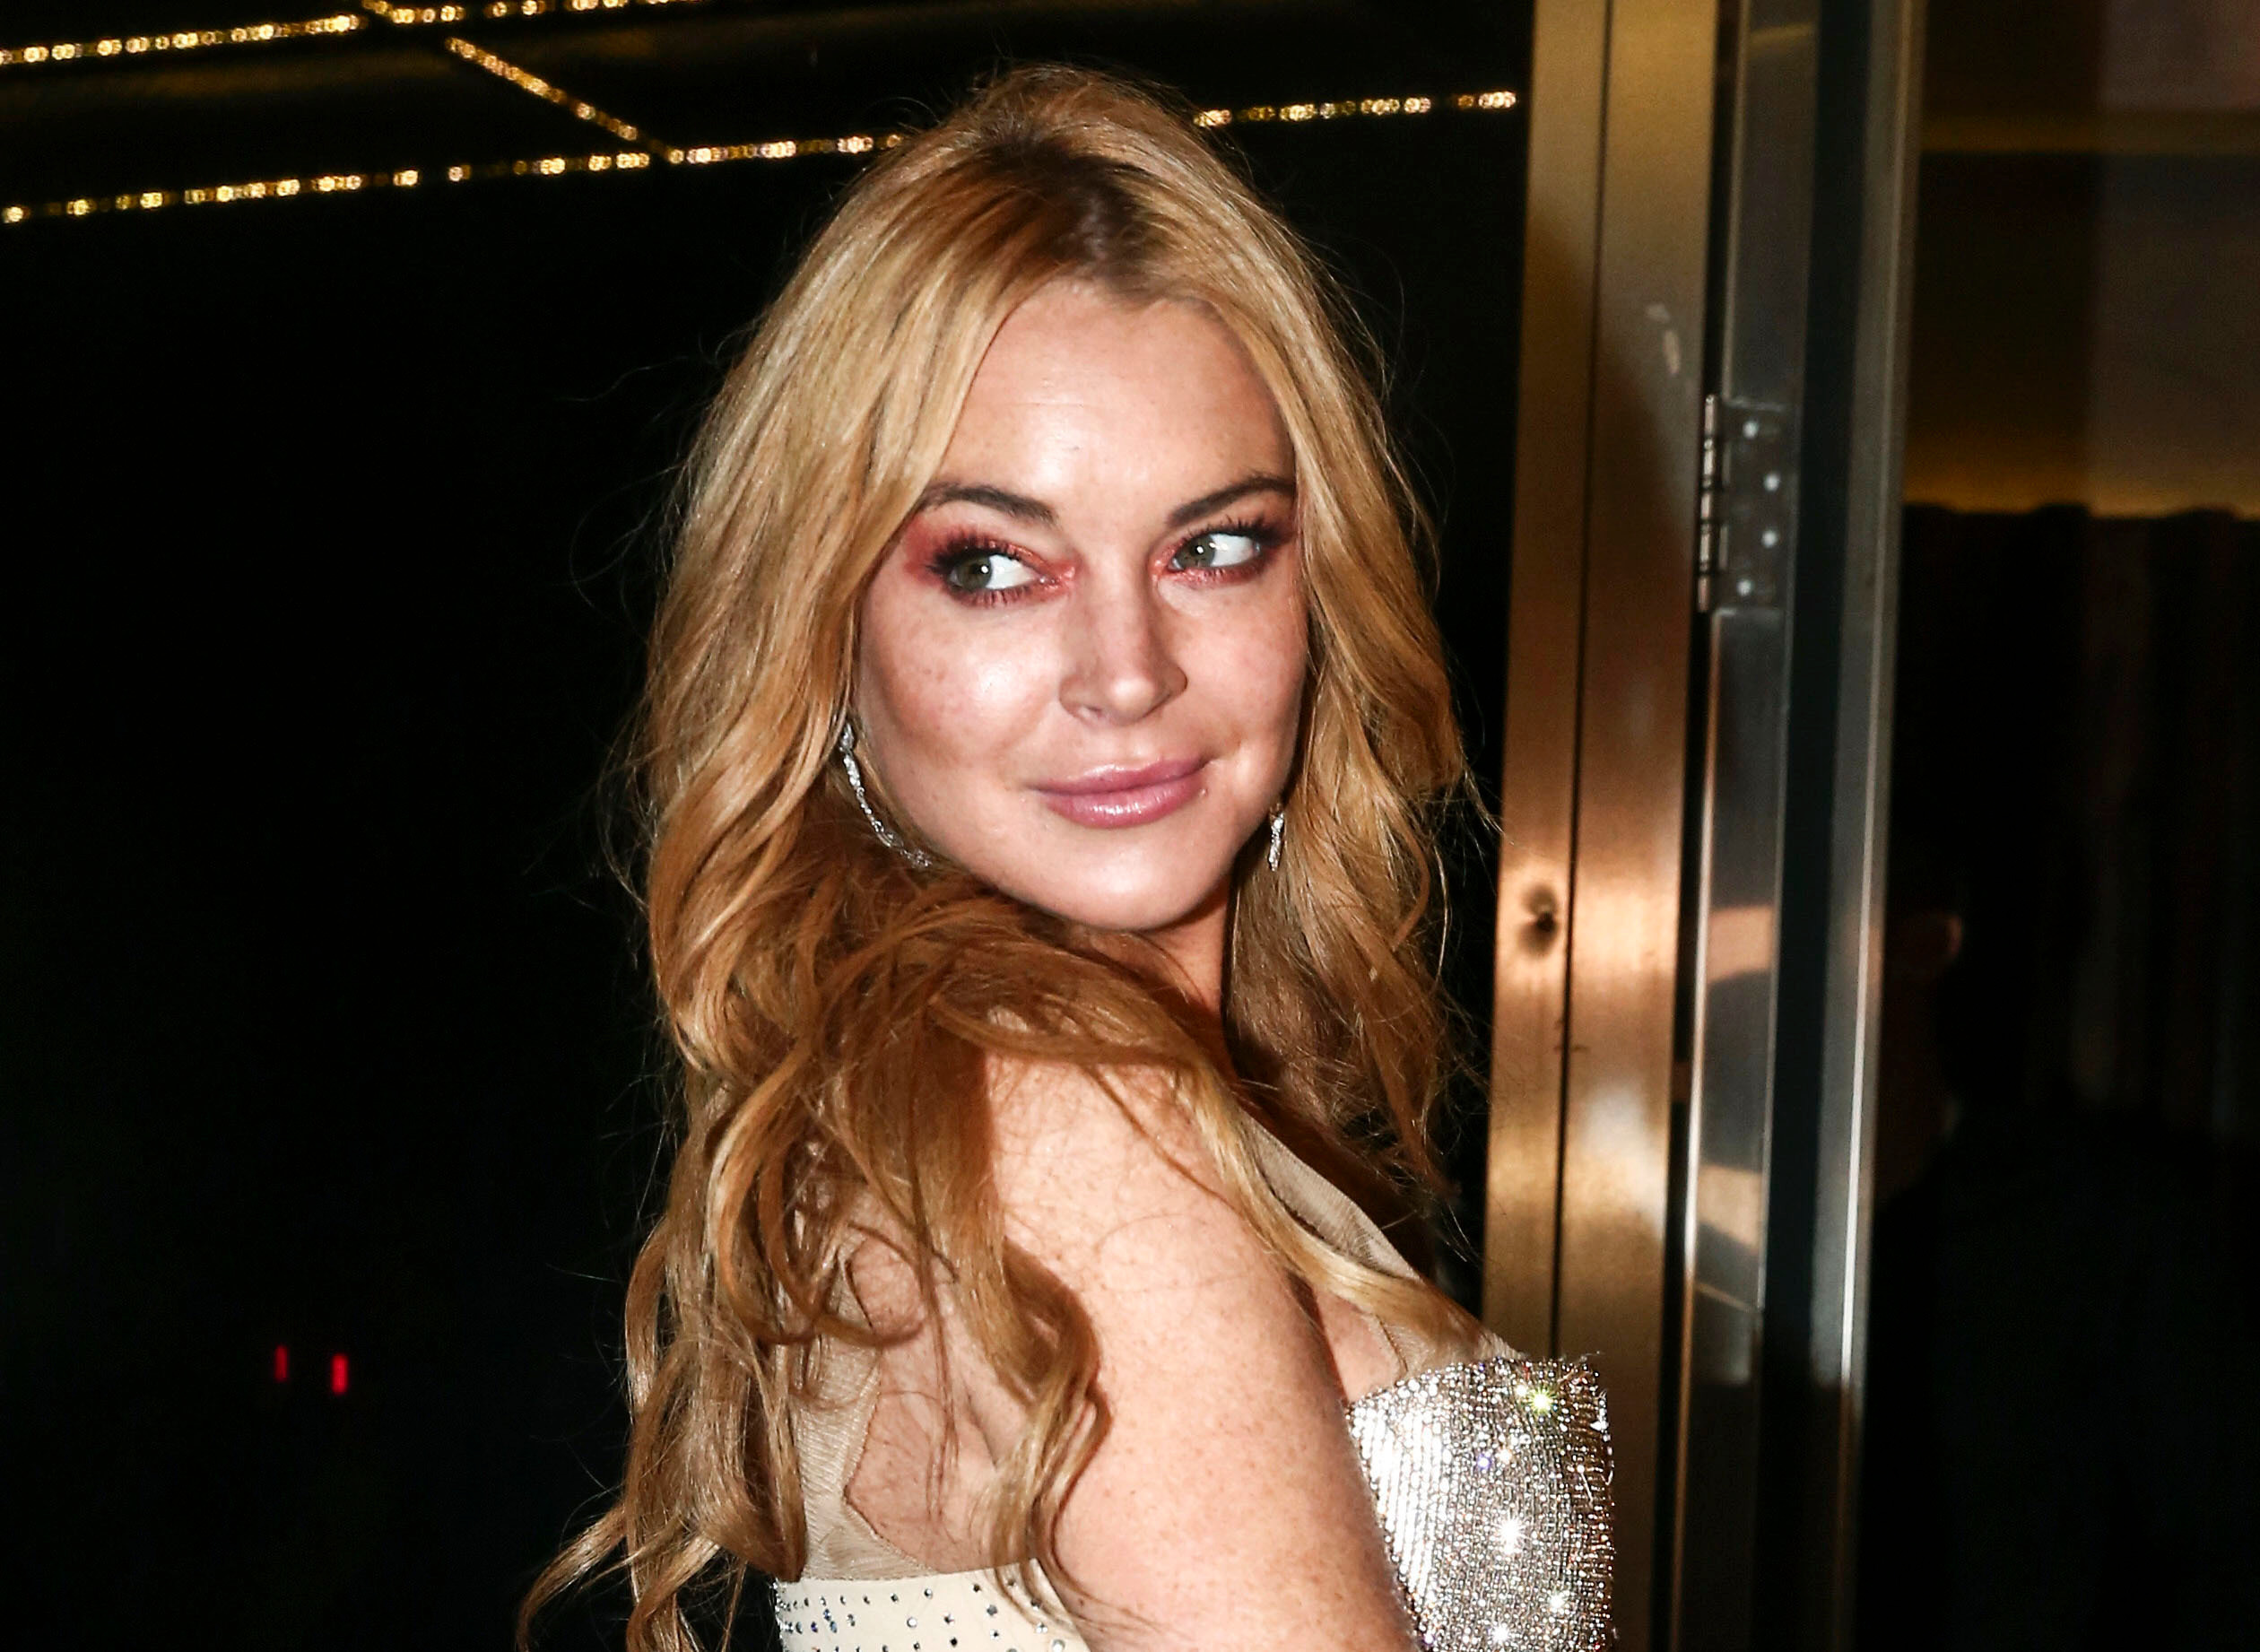 Lindsay Lohan, opening night, Lohan Nightclub in Athens, Greece